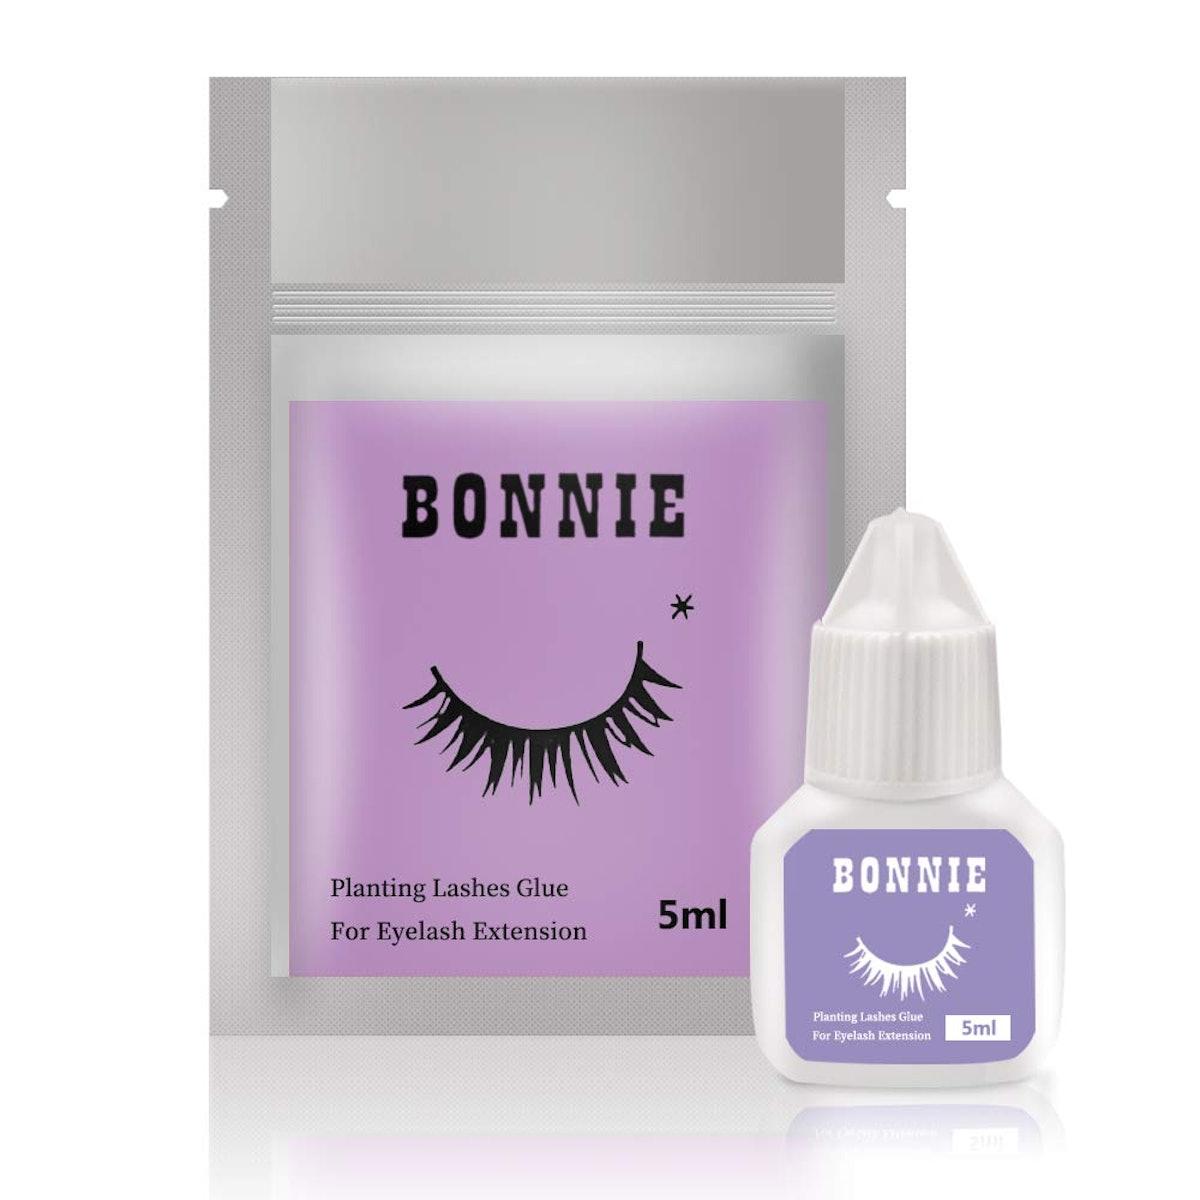 Bonnie Eyelash Extension Glue